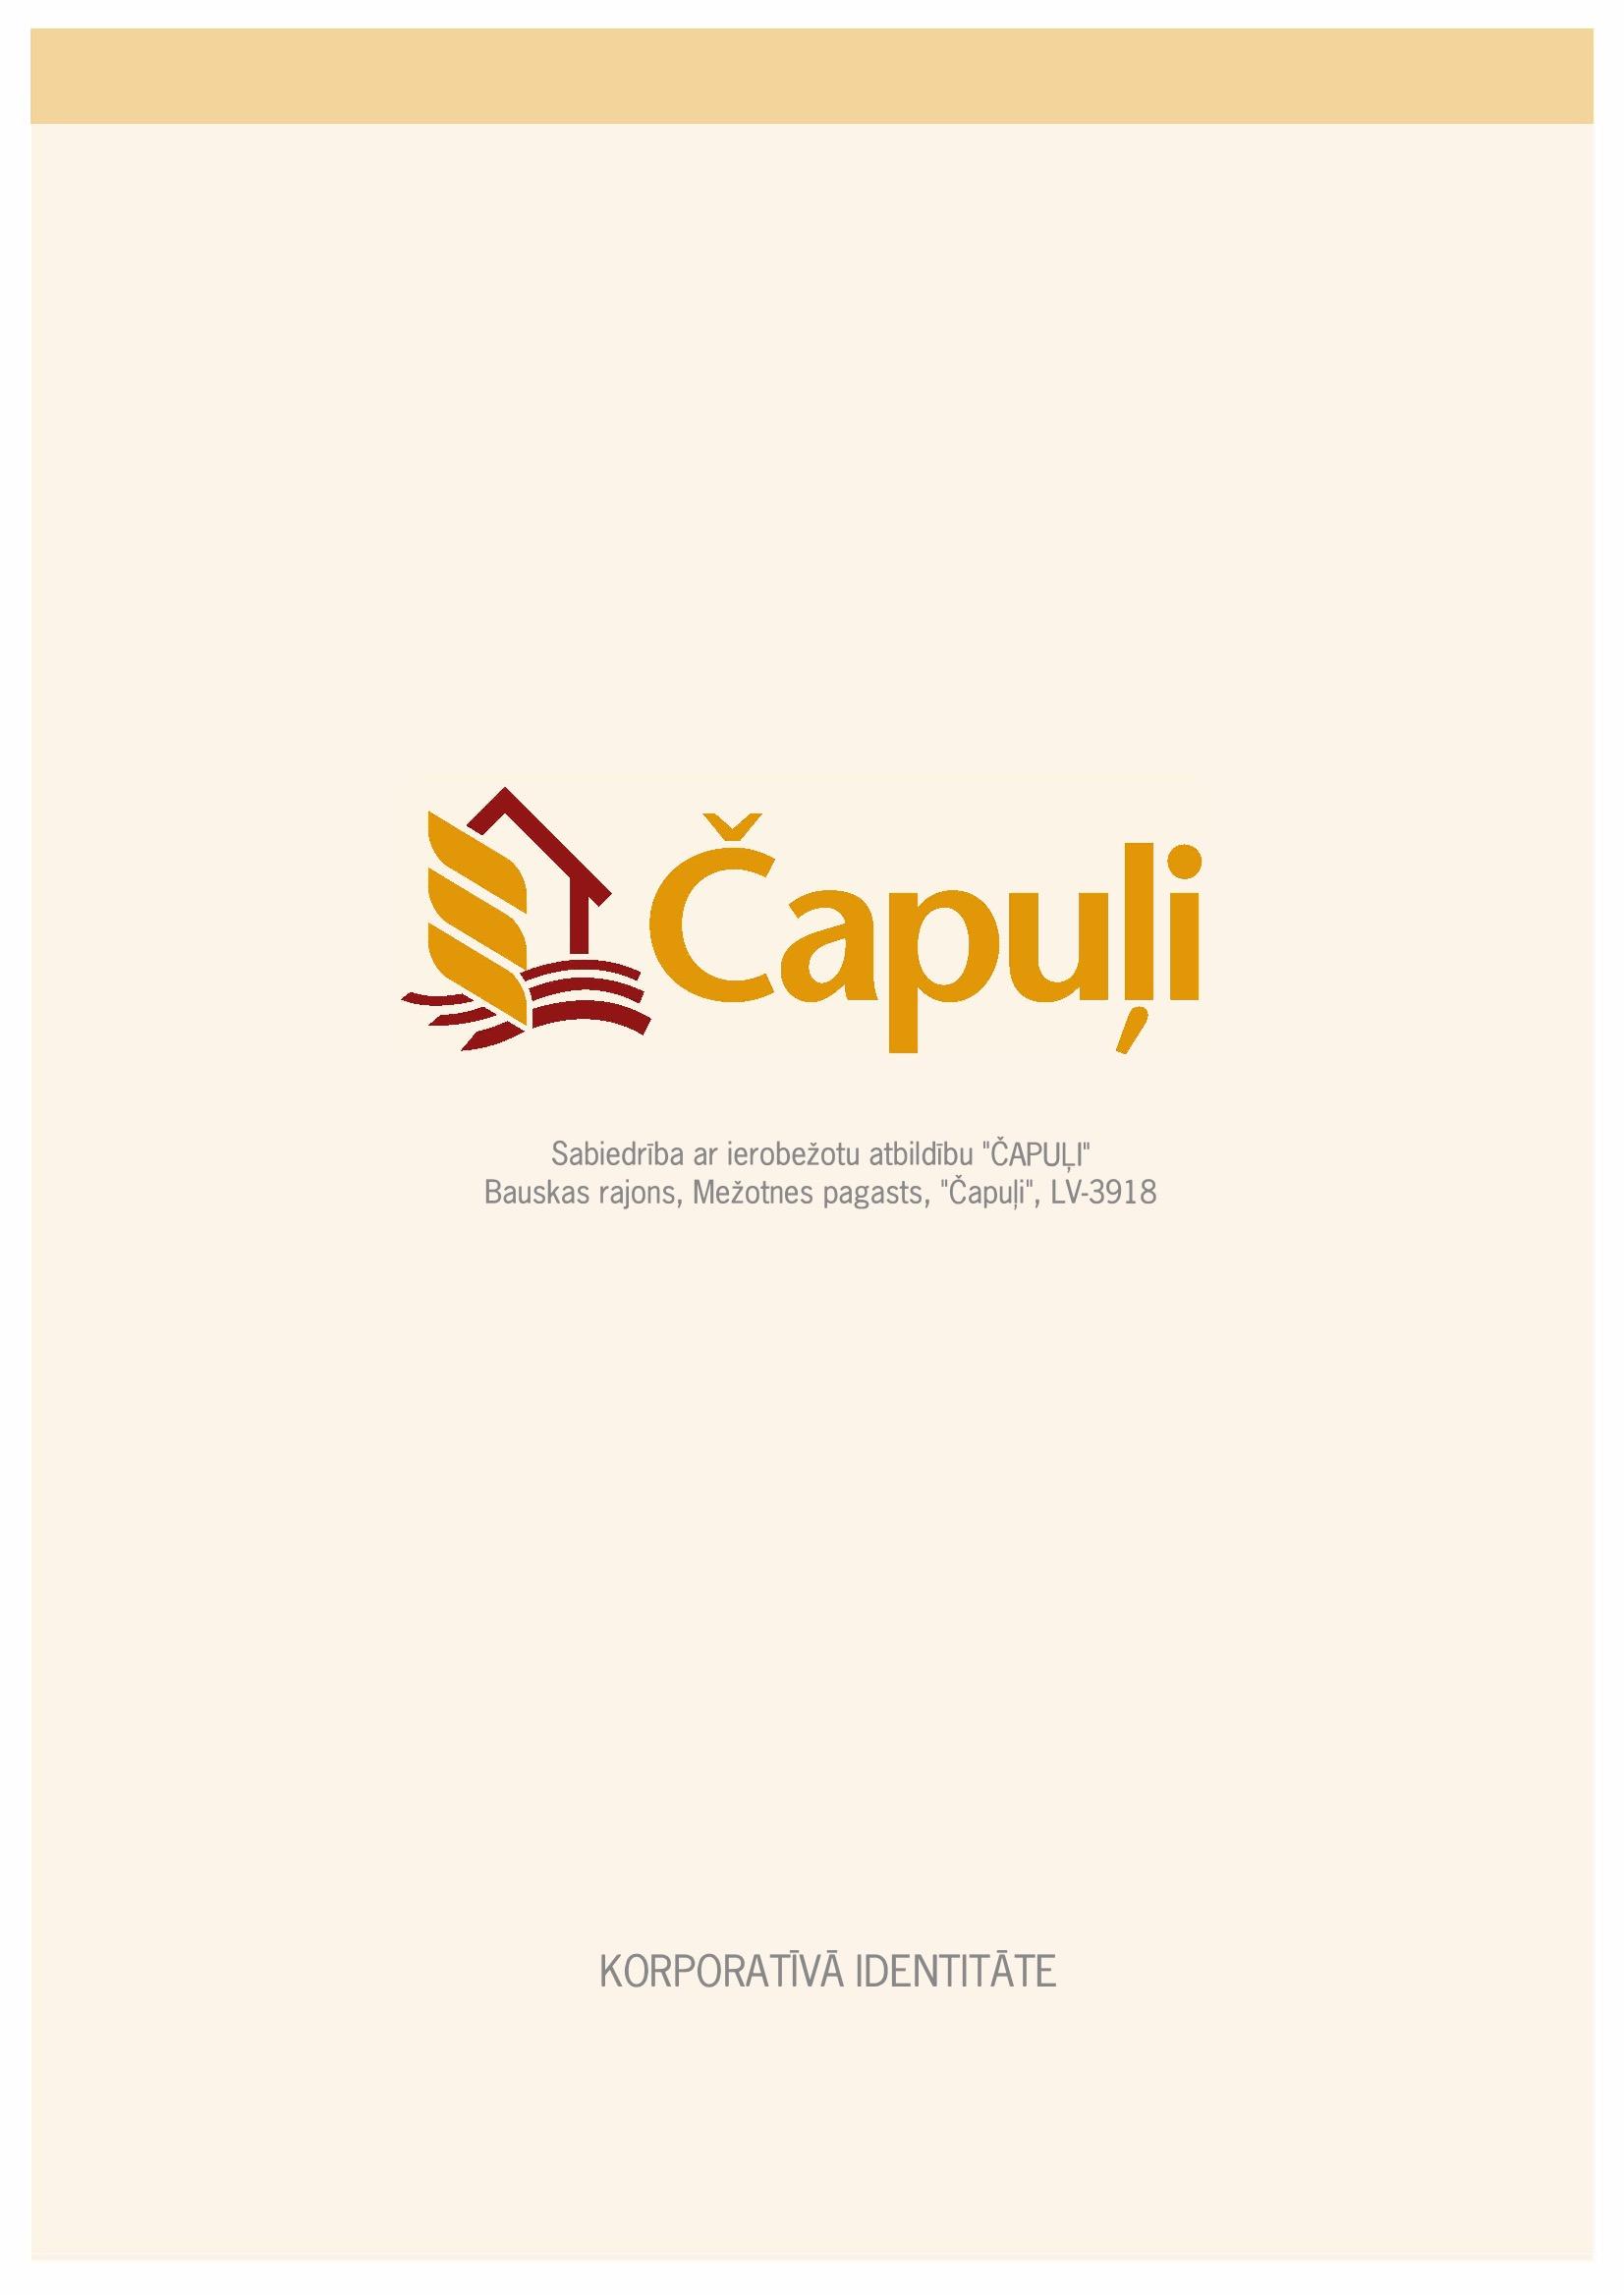 Chapulji_Stils 1